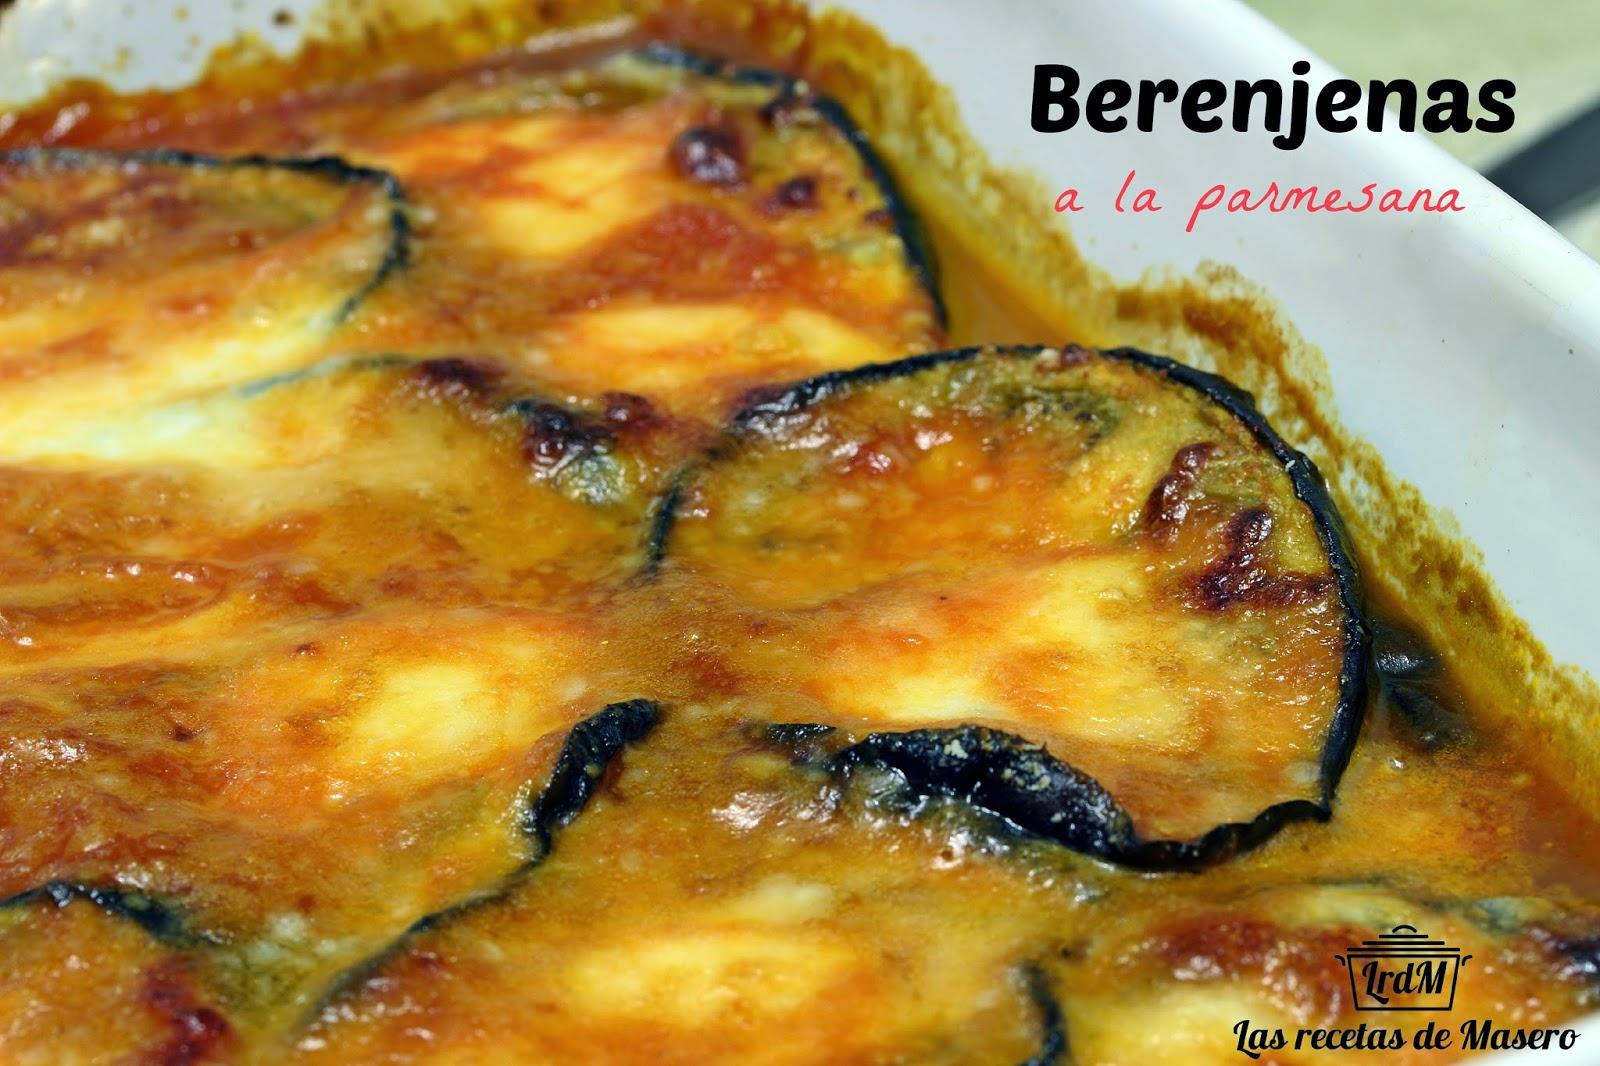 Pastelon Berenjena Parmesana Berenjenas a la Parmesana 2